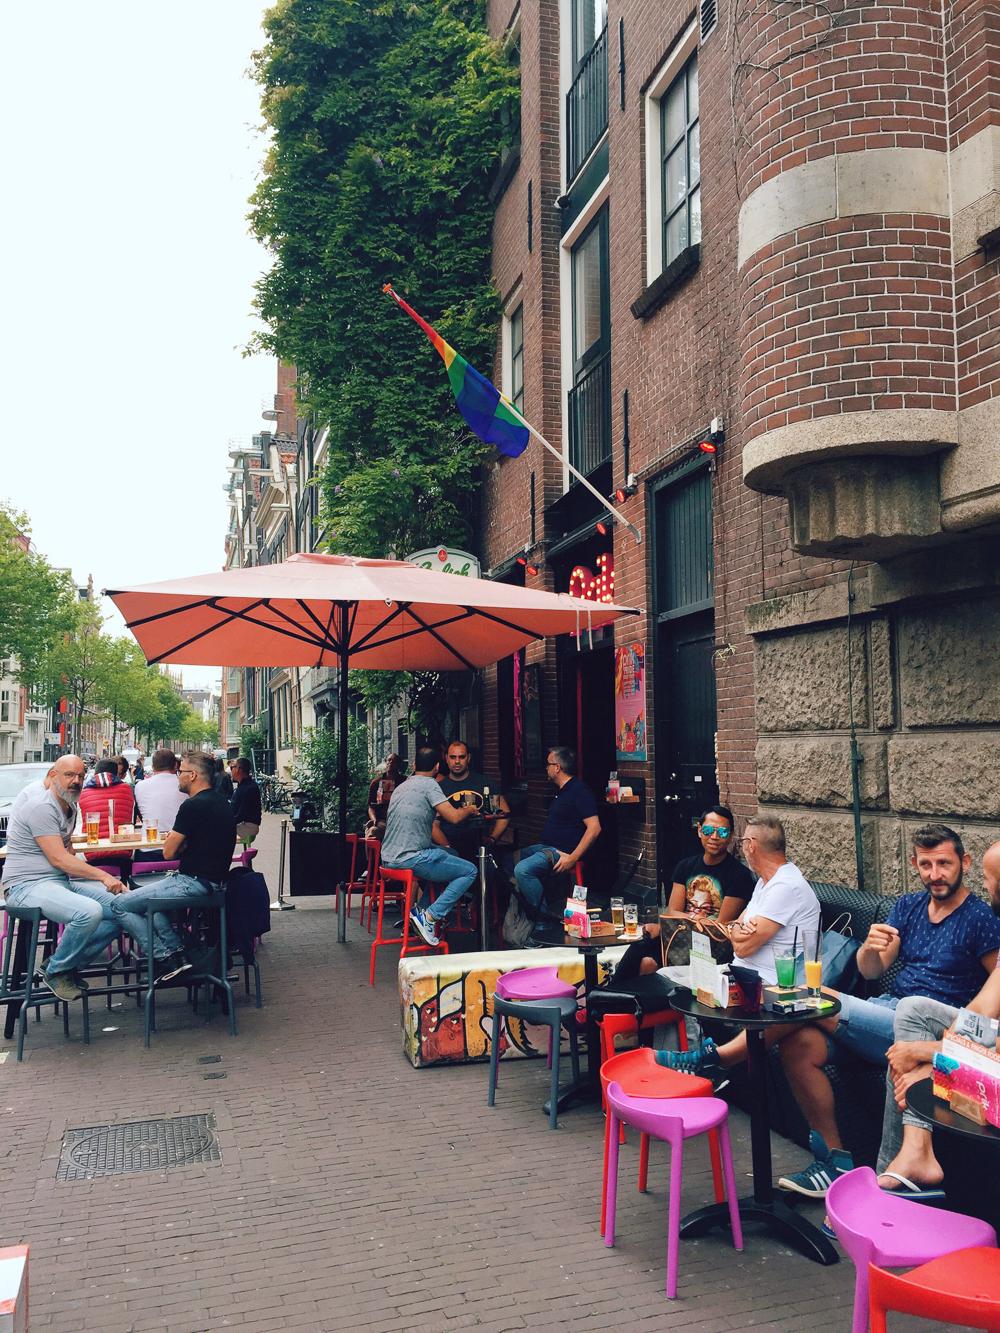 PRIK, Amsterdam, Netherlands